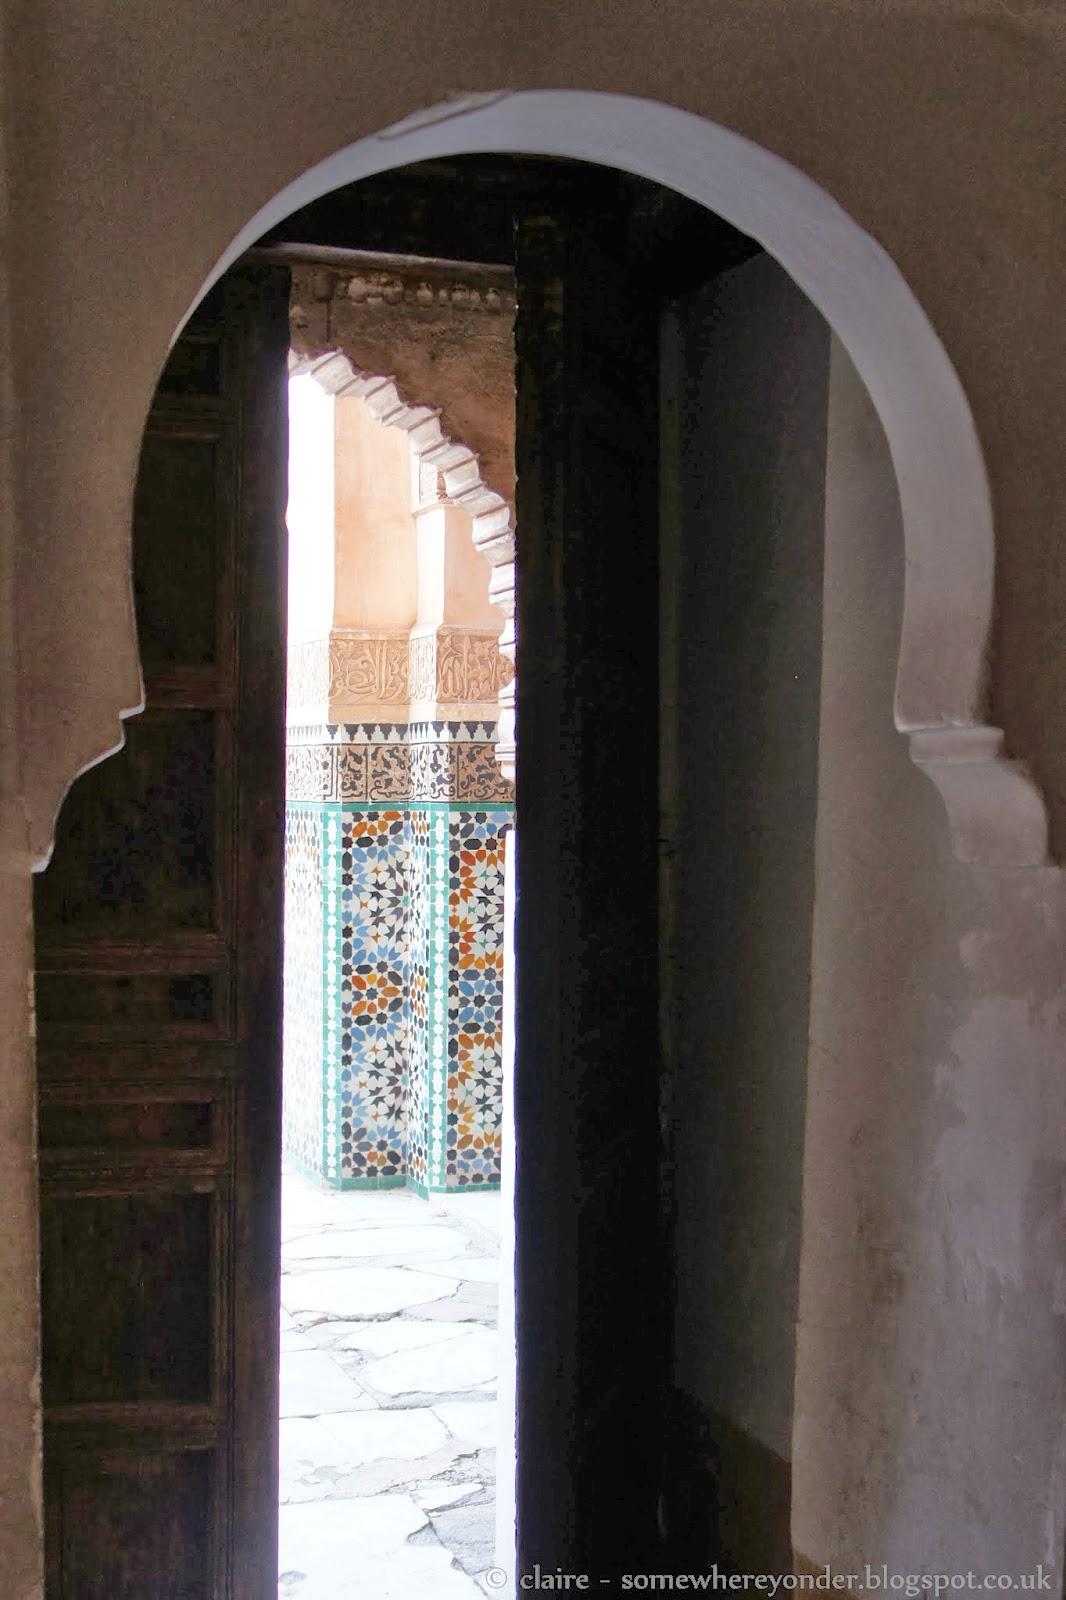 Open door and geometric patterns at Ben Youssef Madrasa, Marrakech